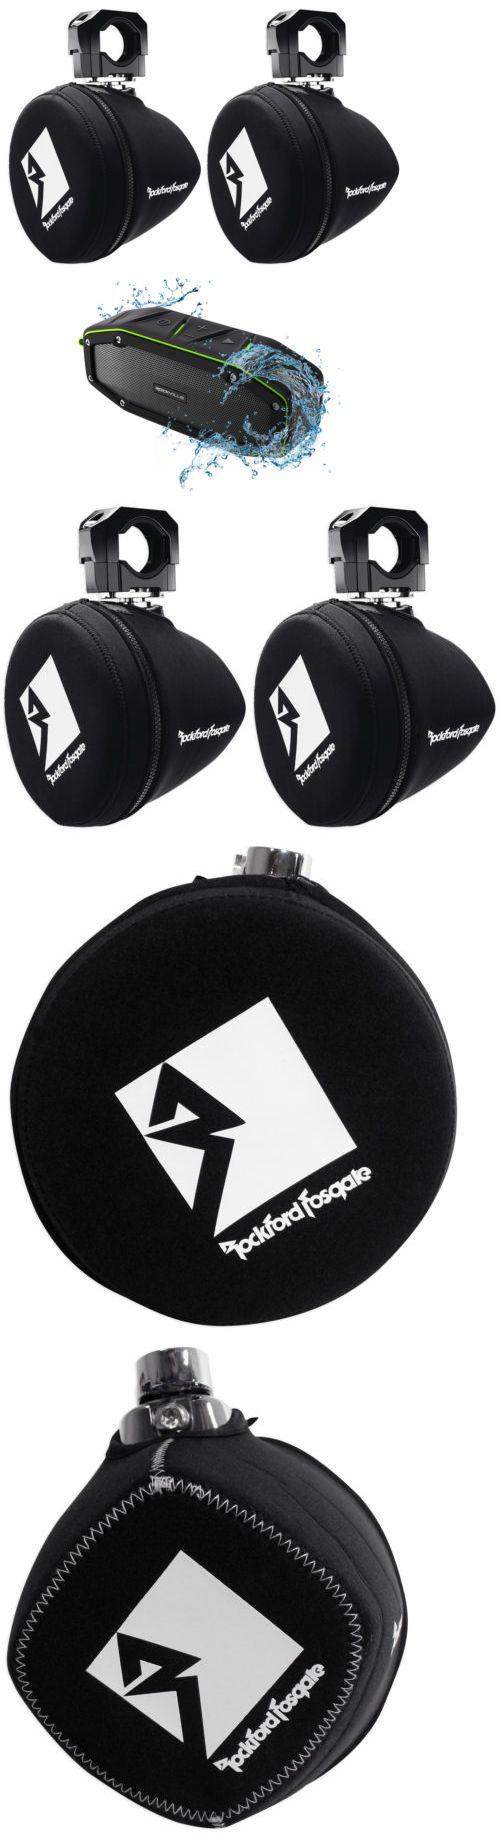 Marine Audio: (2) Rockford Fosgate Pm265-Spfm Marine 6.5 Mini Wakeboard Tower Covers+Speaker -> BUY IT NOW ONLY: $79.99 on eBay!